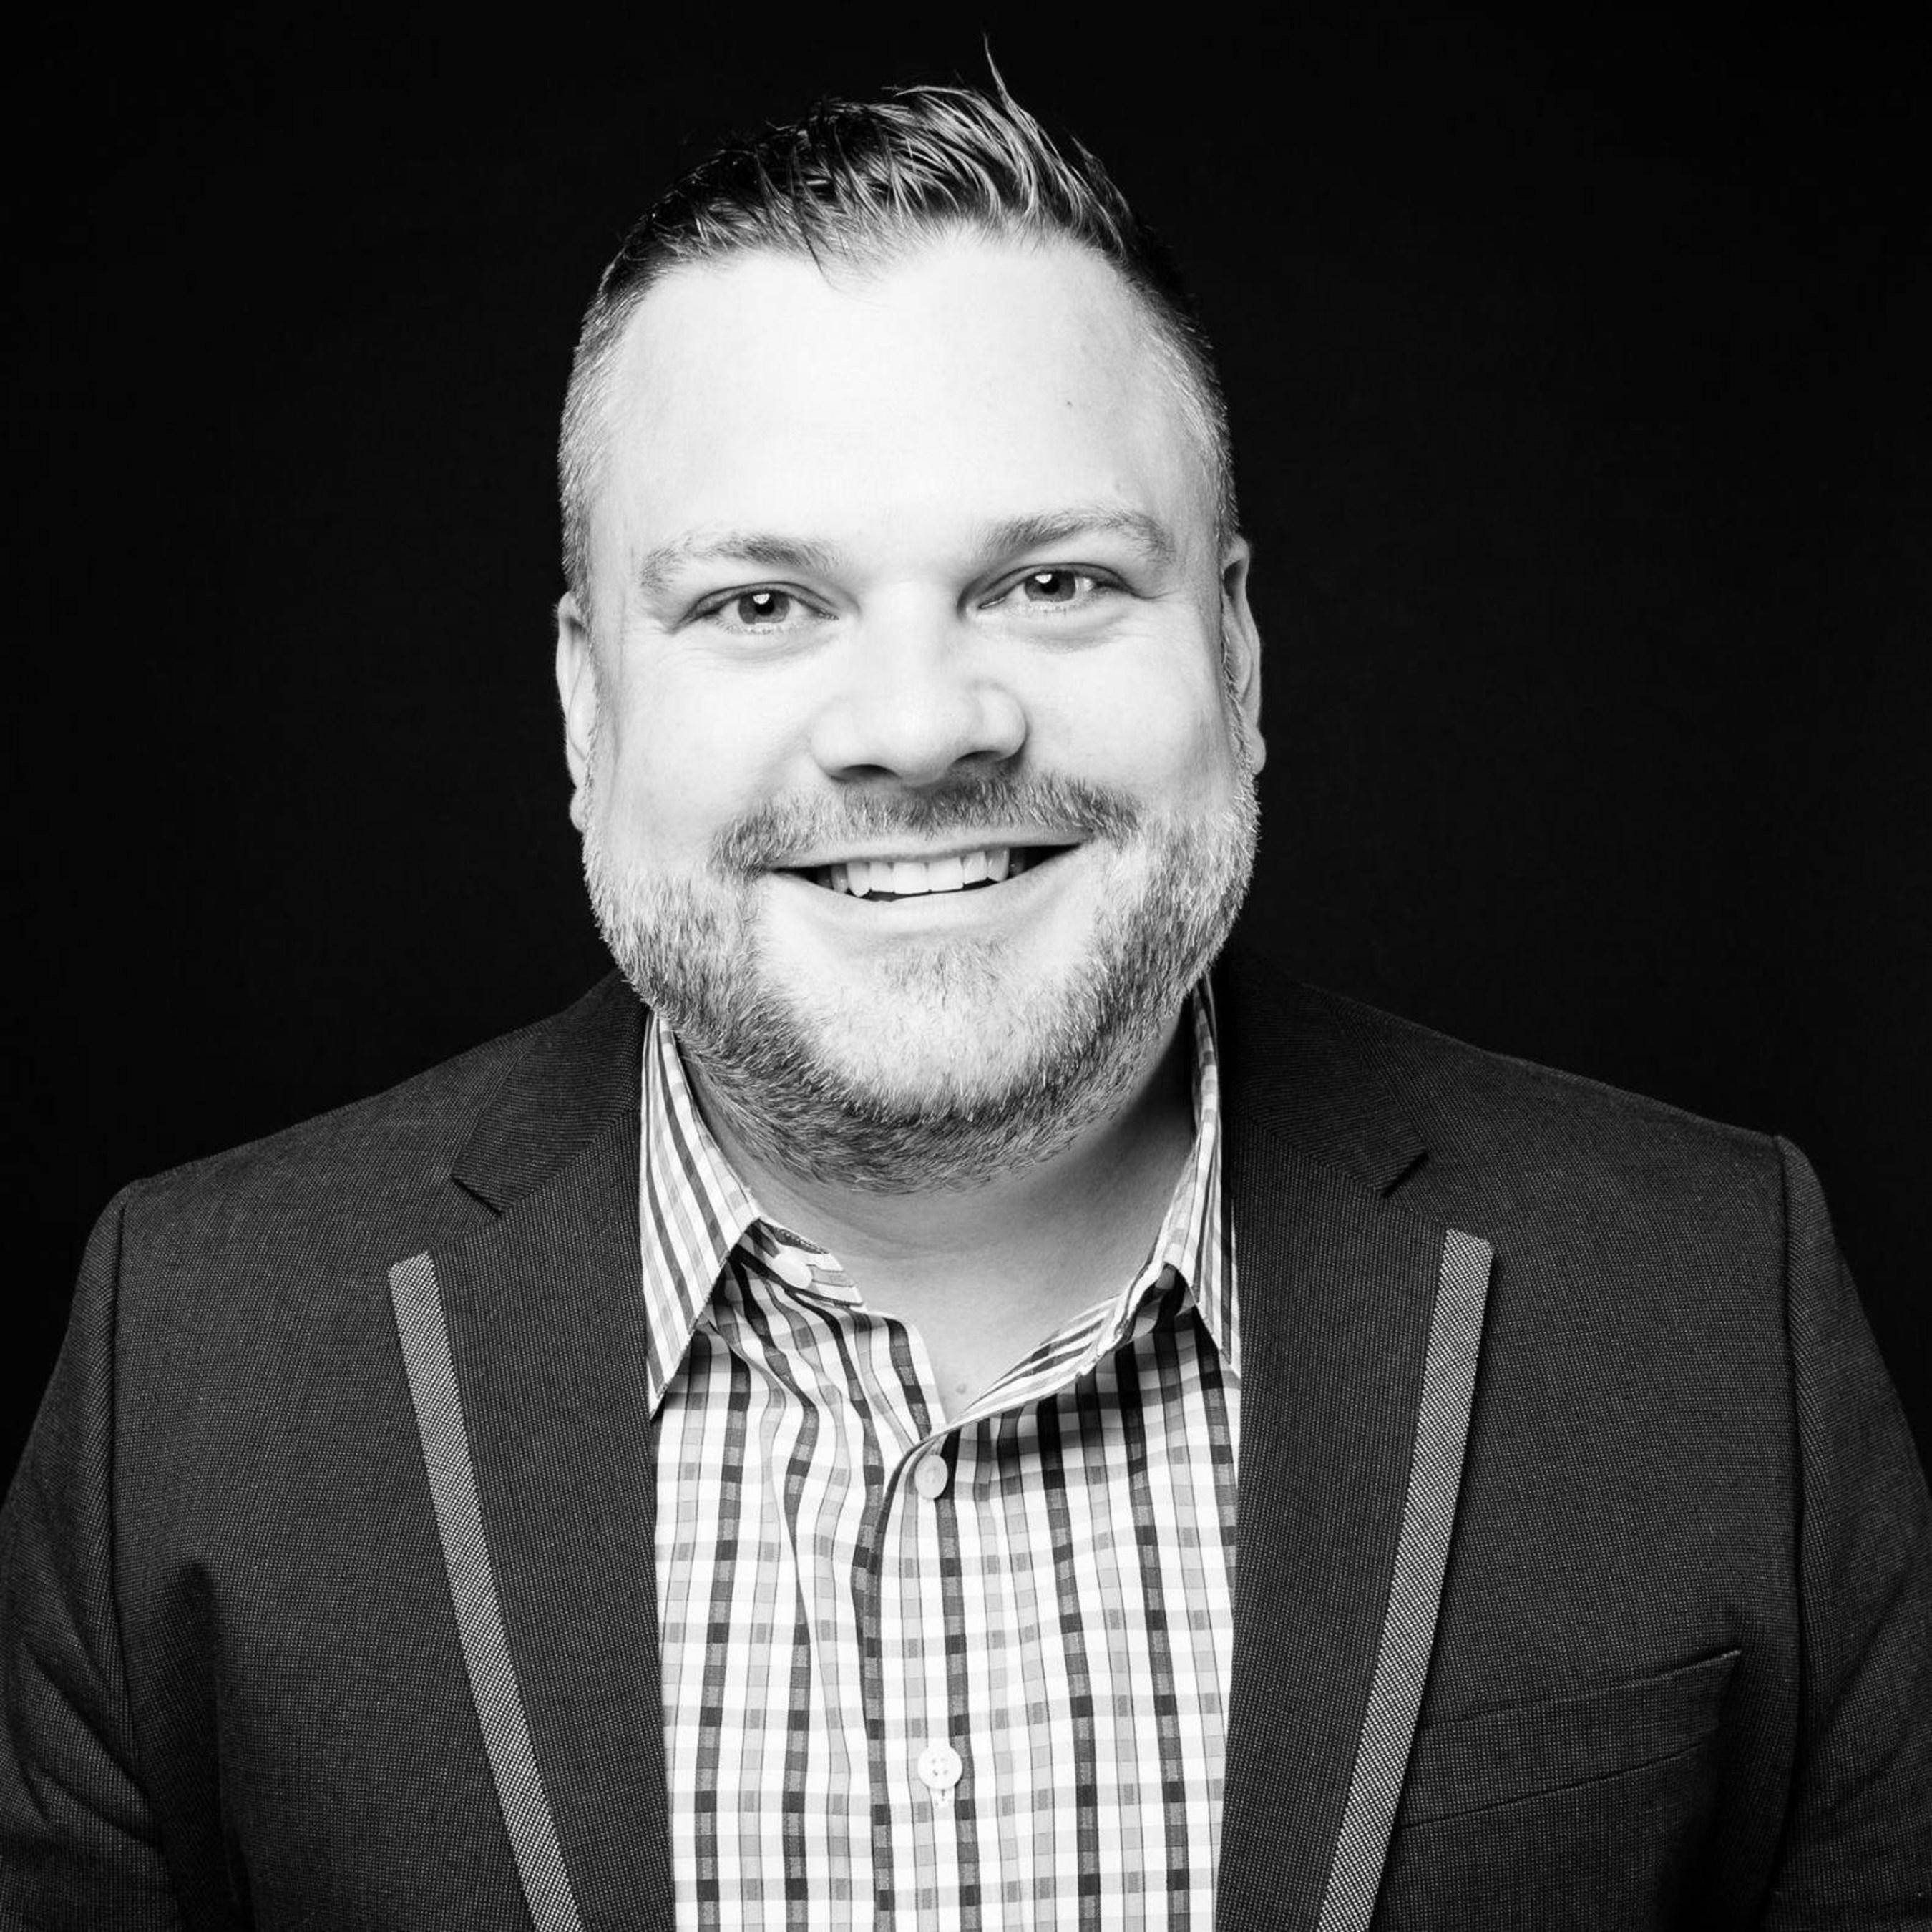 RJ Pauloski, VP Sales and Business Development at Teads